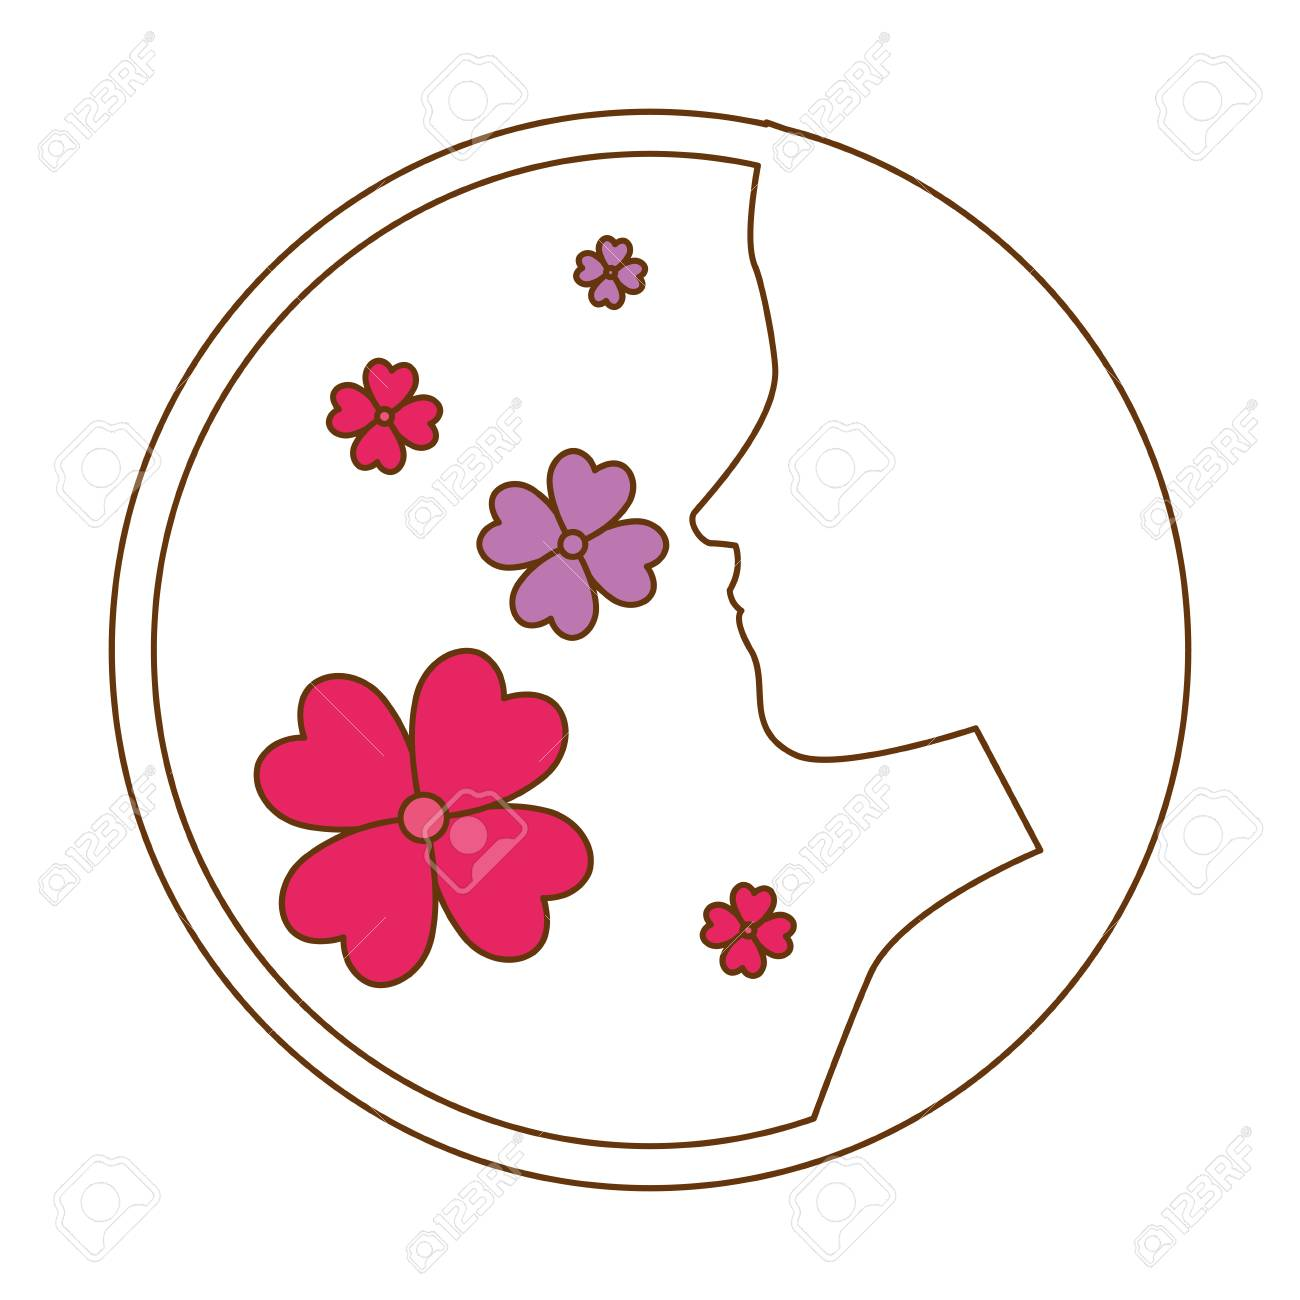 Beautiful woman profile with flowers silhouette vector illustration beautiful woman profile with flowers silhouette vector illustration design stock vector 95776386 izmirmasajfo